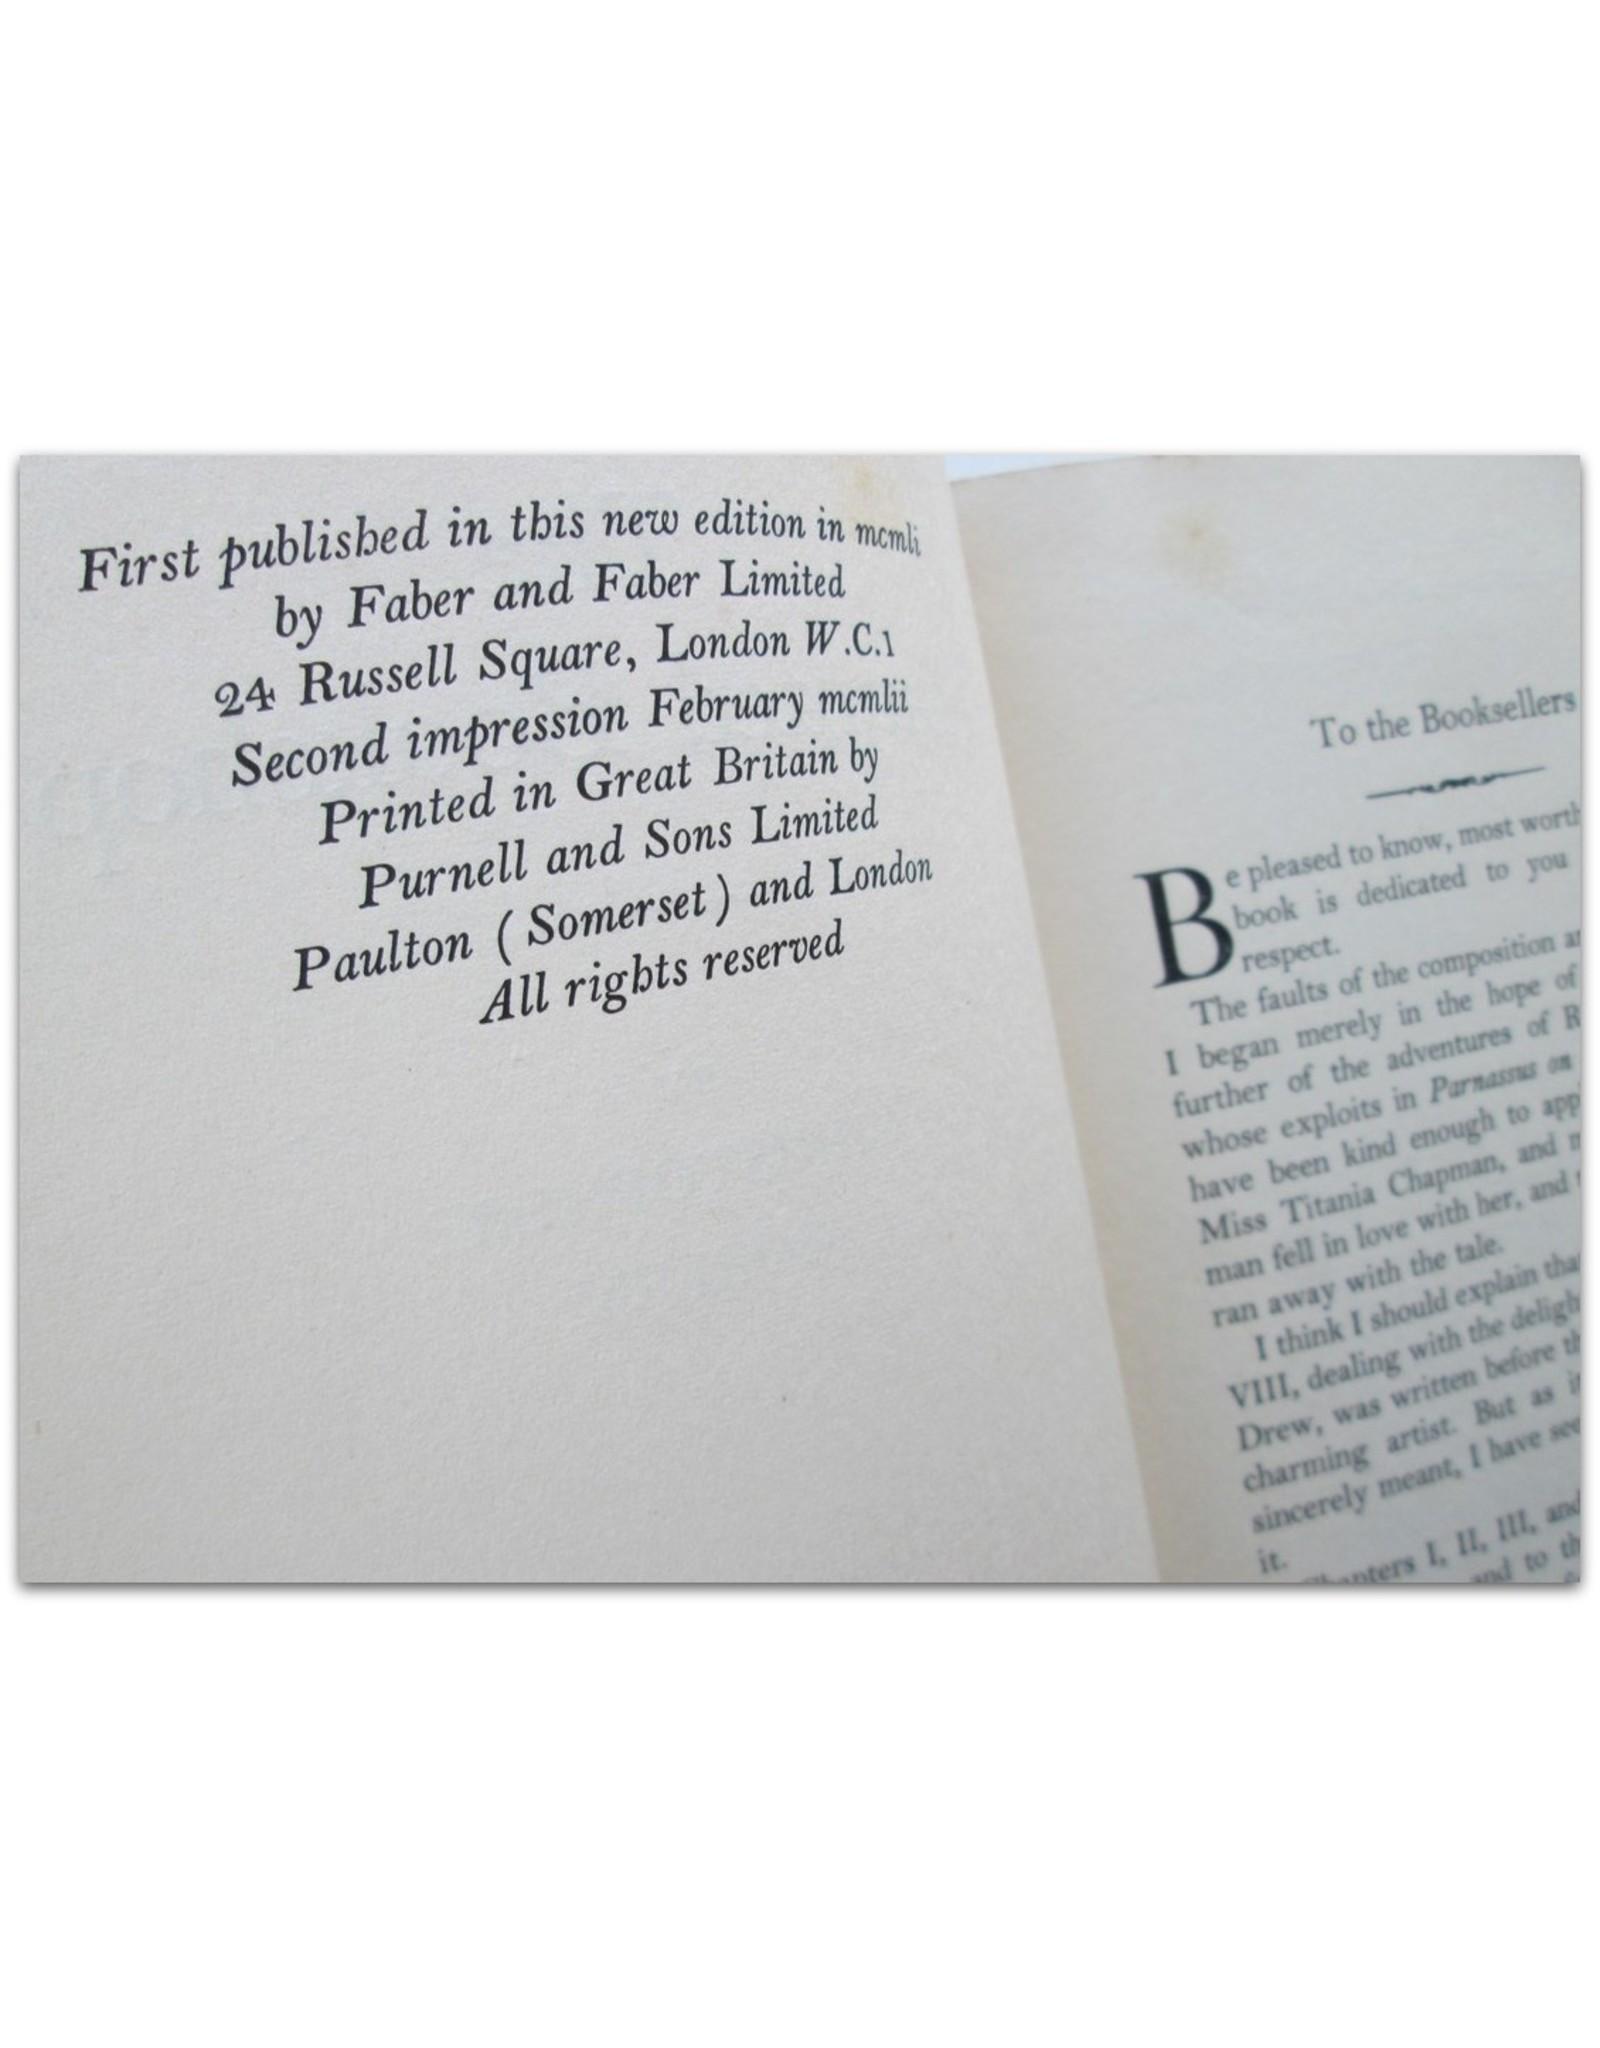 Christopher Morley - The Haunted Bookshop